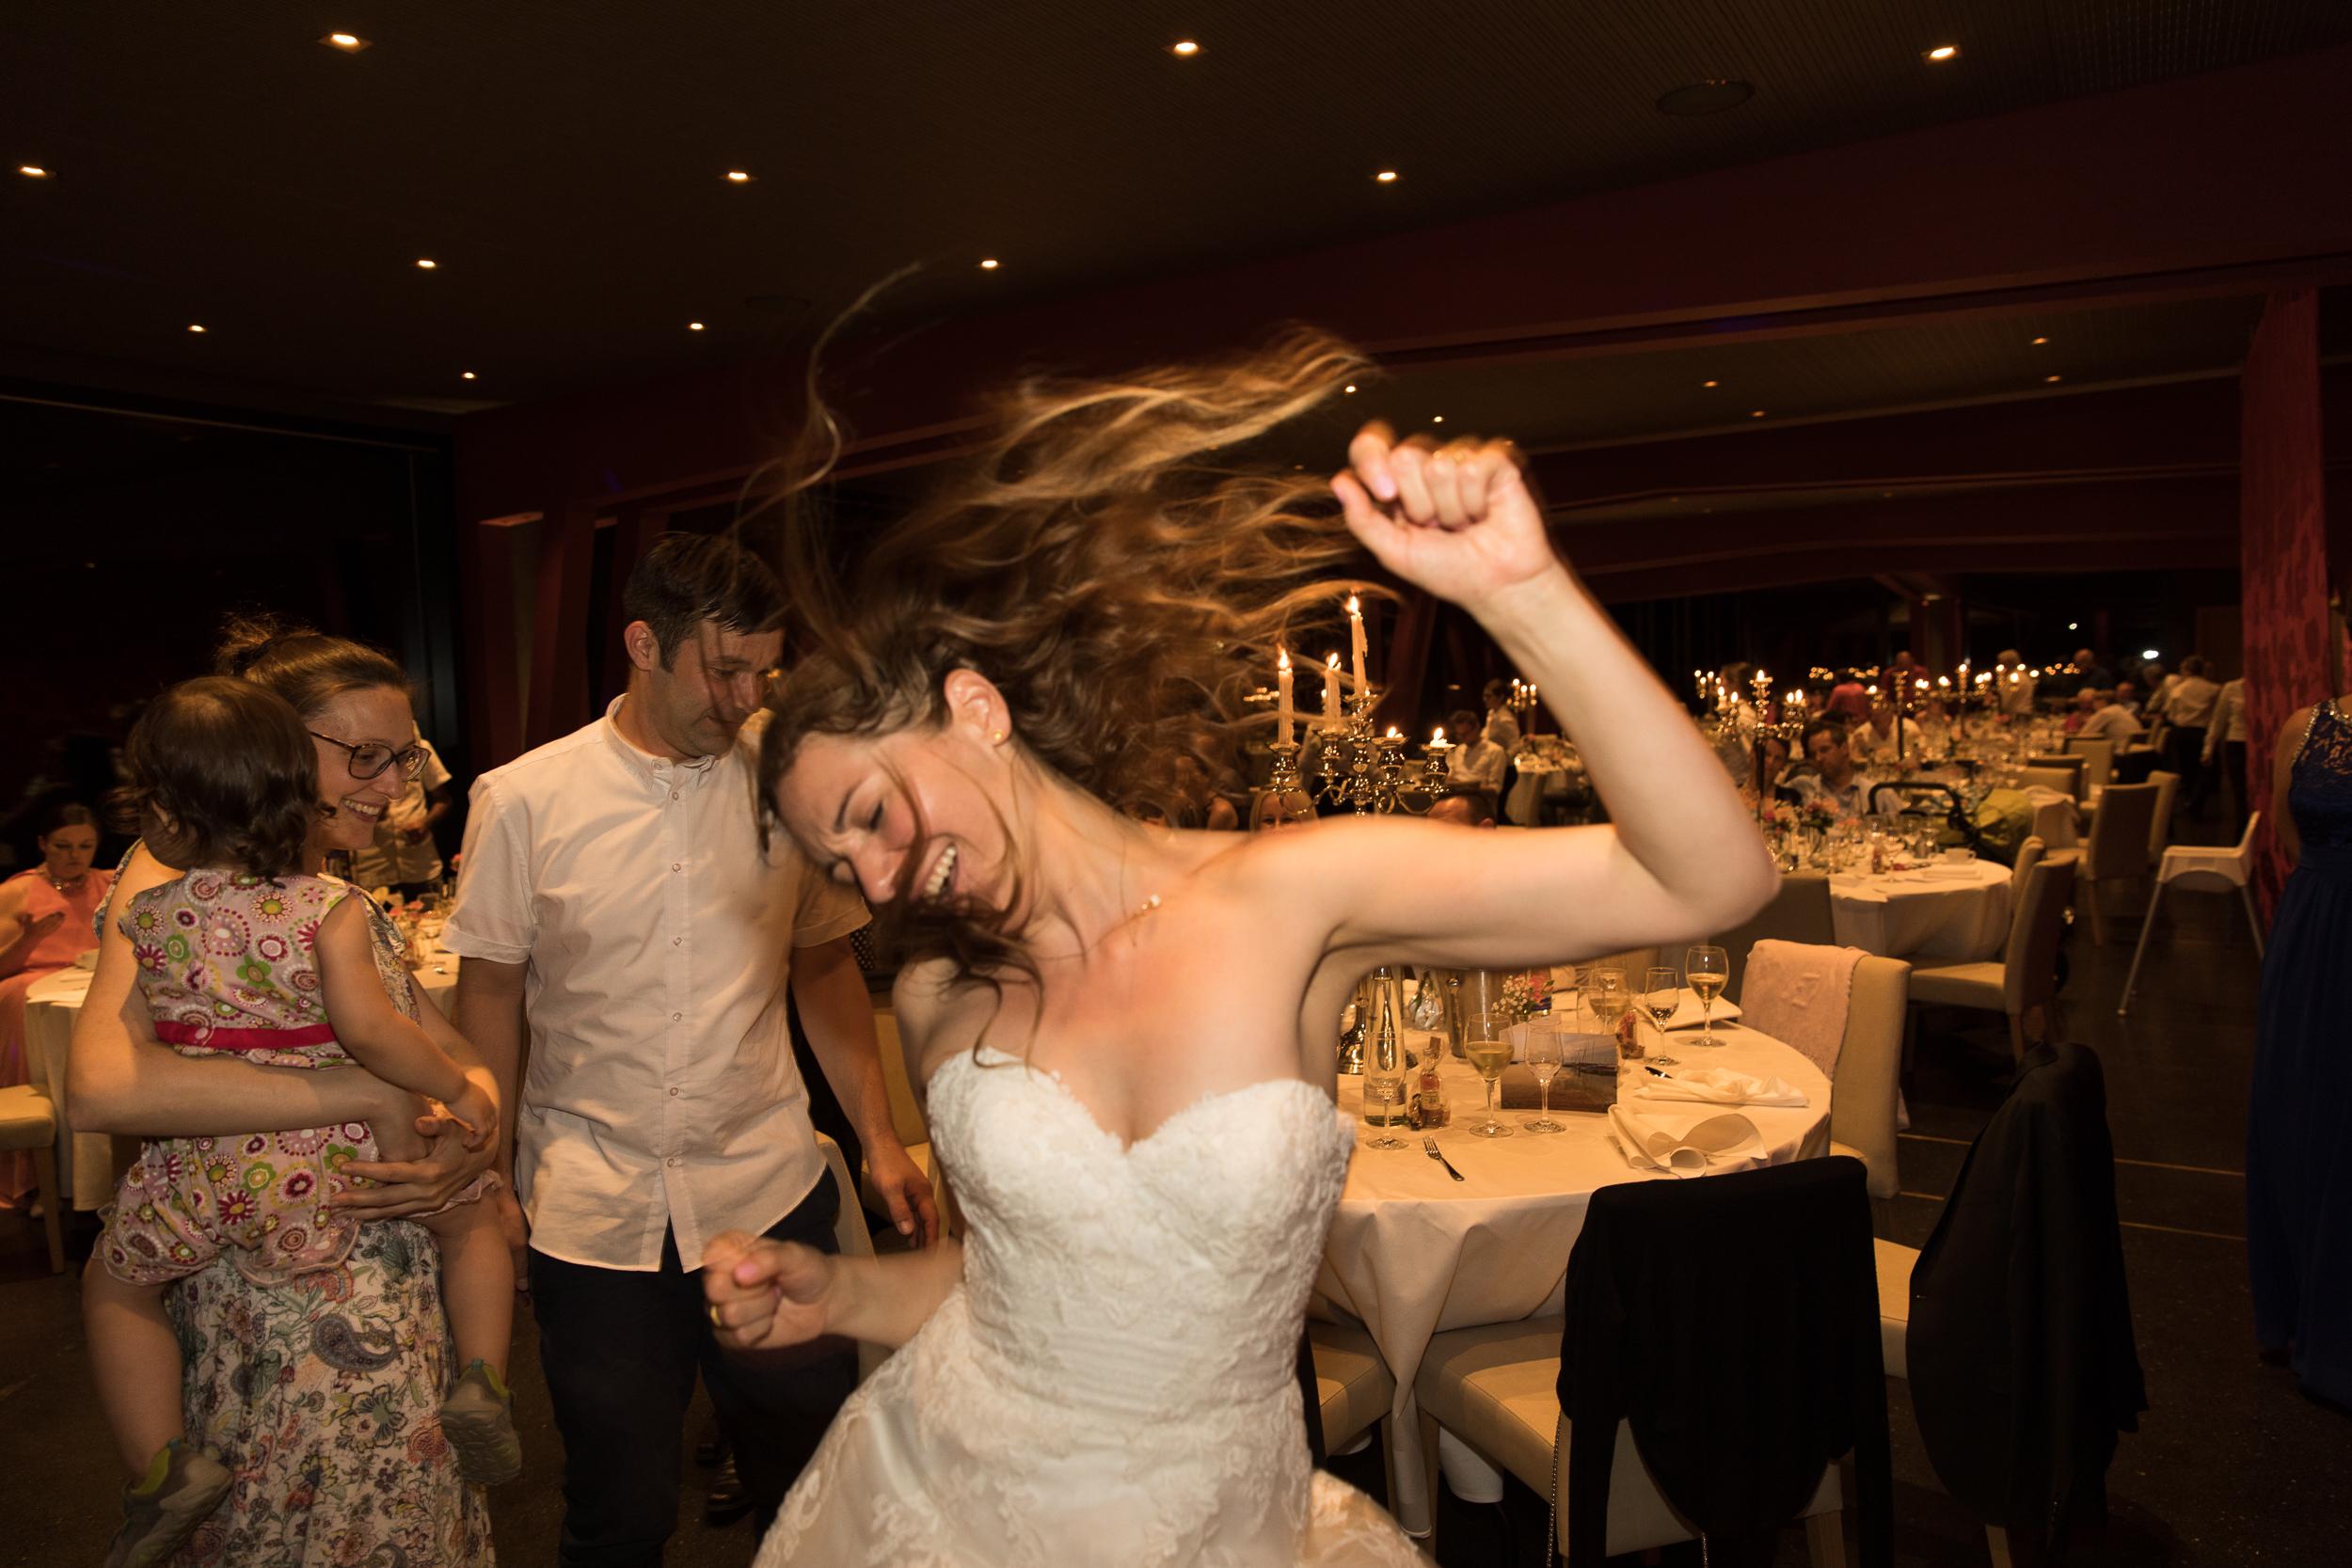 Gregg_Thorne_Wedding_Photographer_Munich_103.jpg